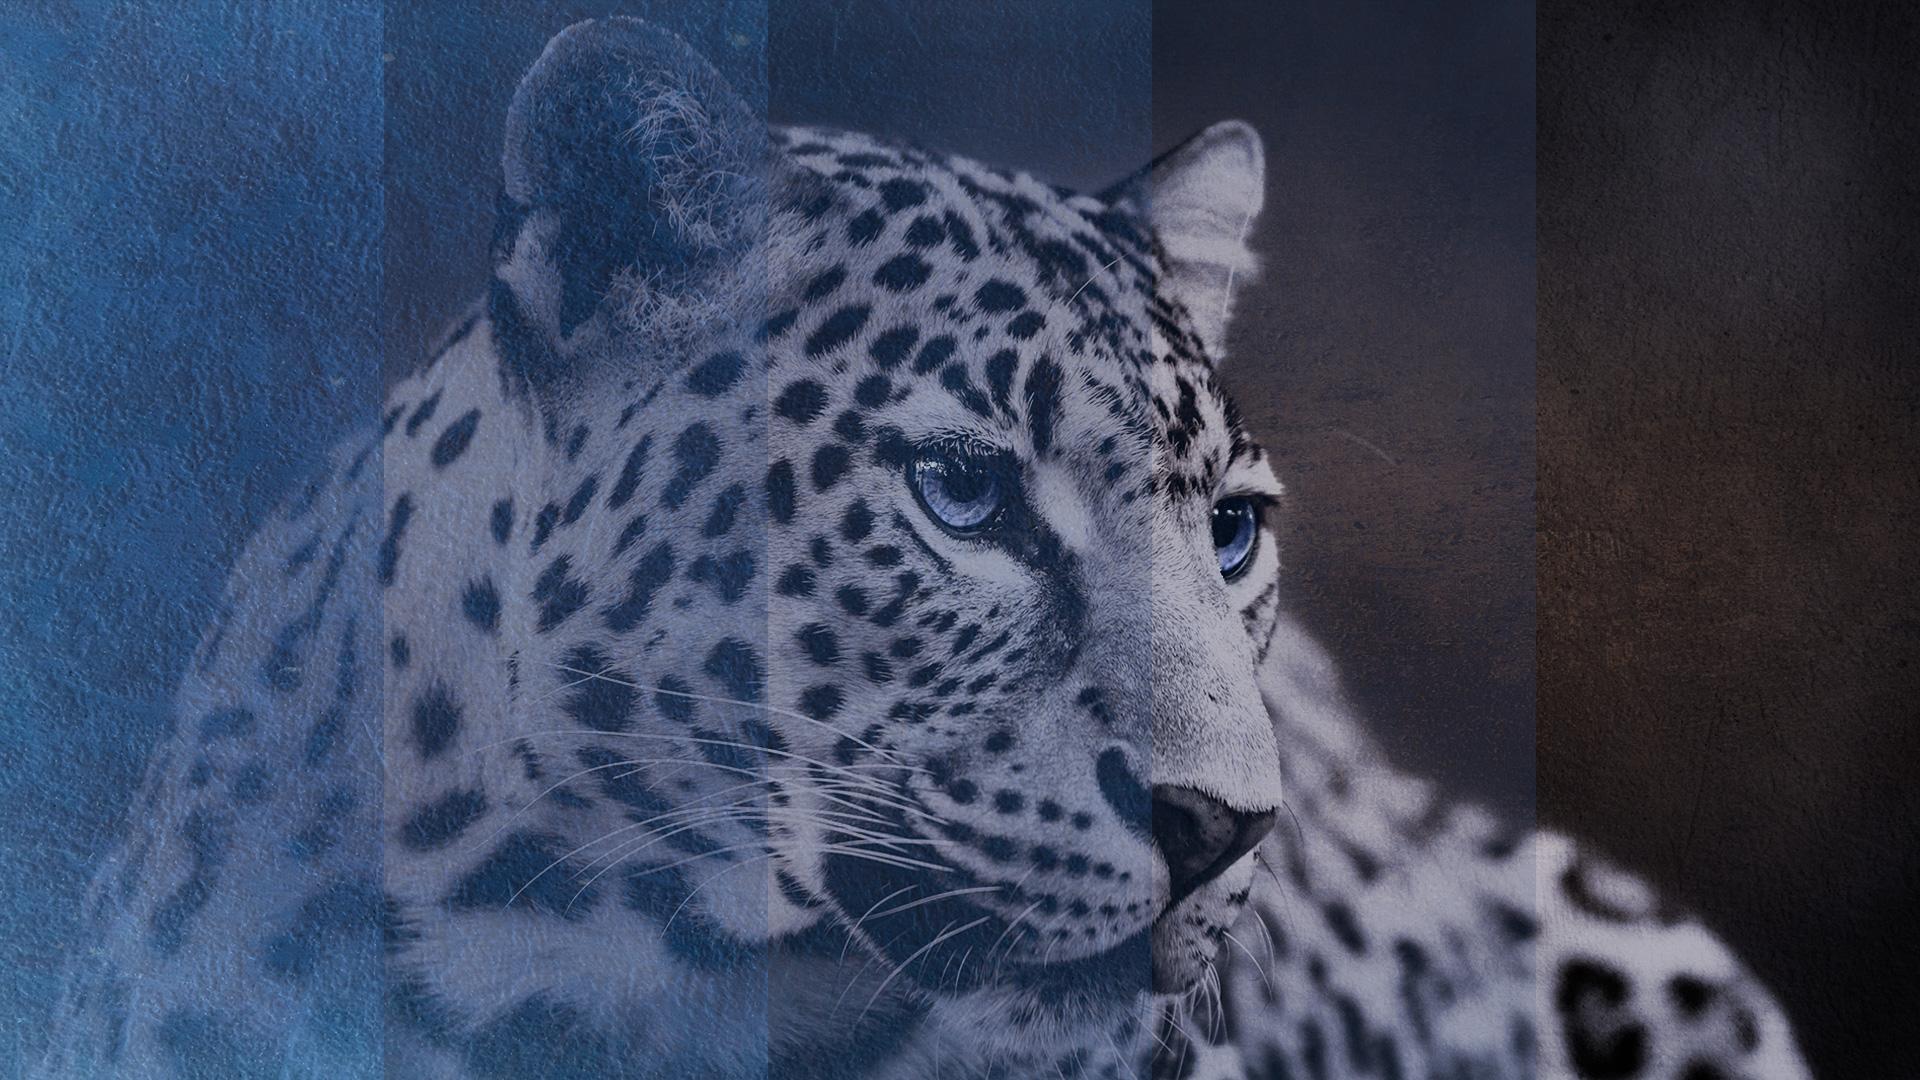 FEATURED-jhahn-leopard-part-2